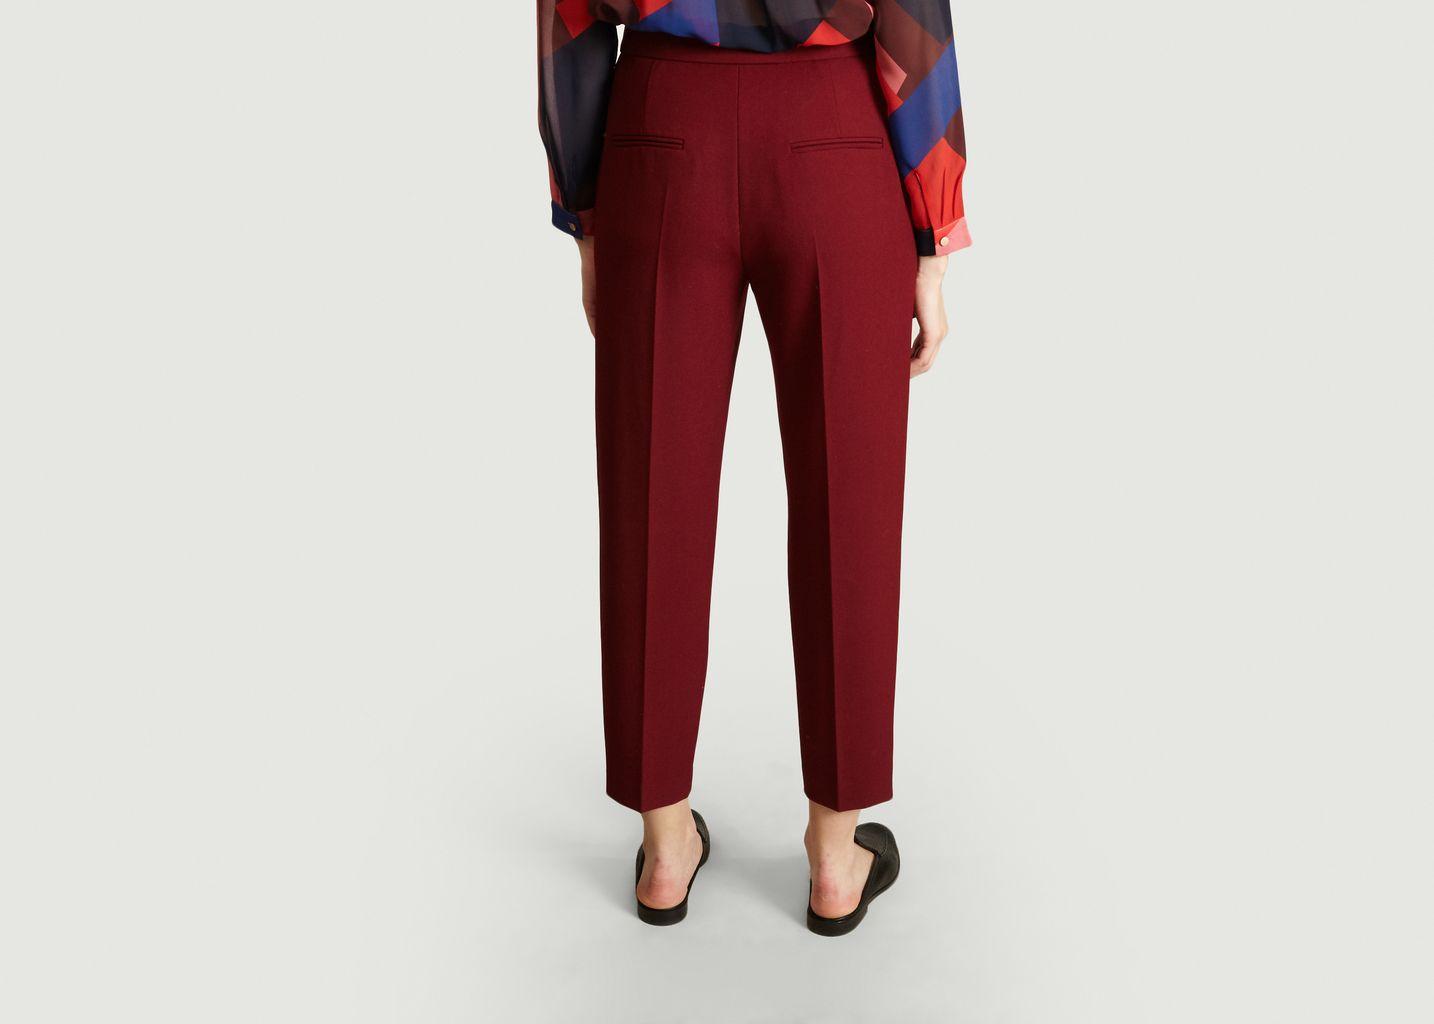 Pantalon 7/8 - Tara Jarmon